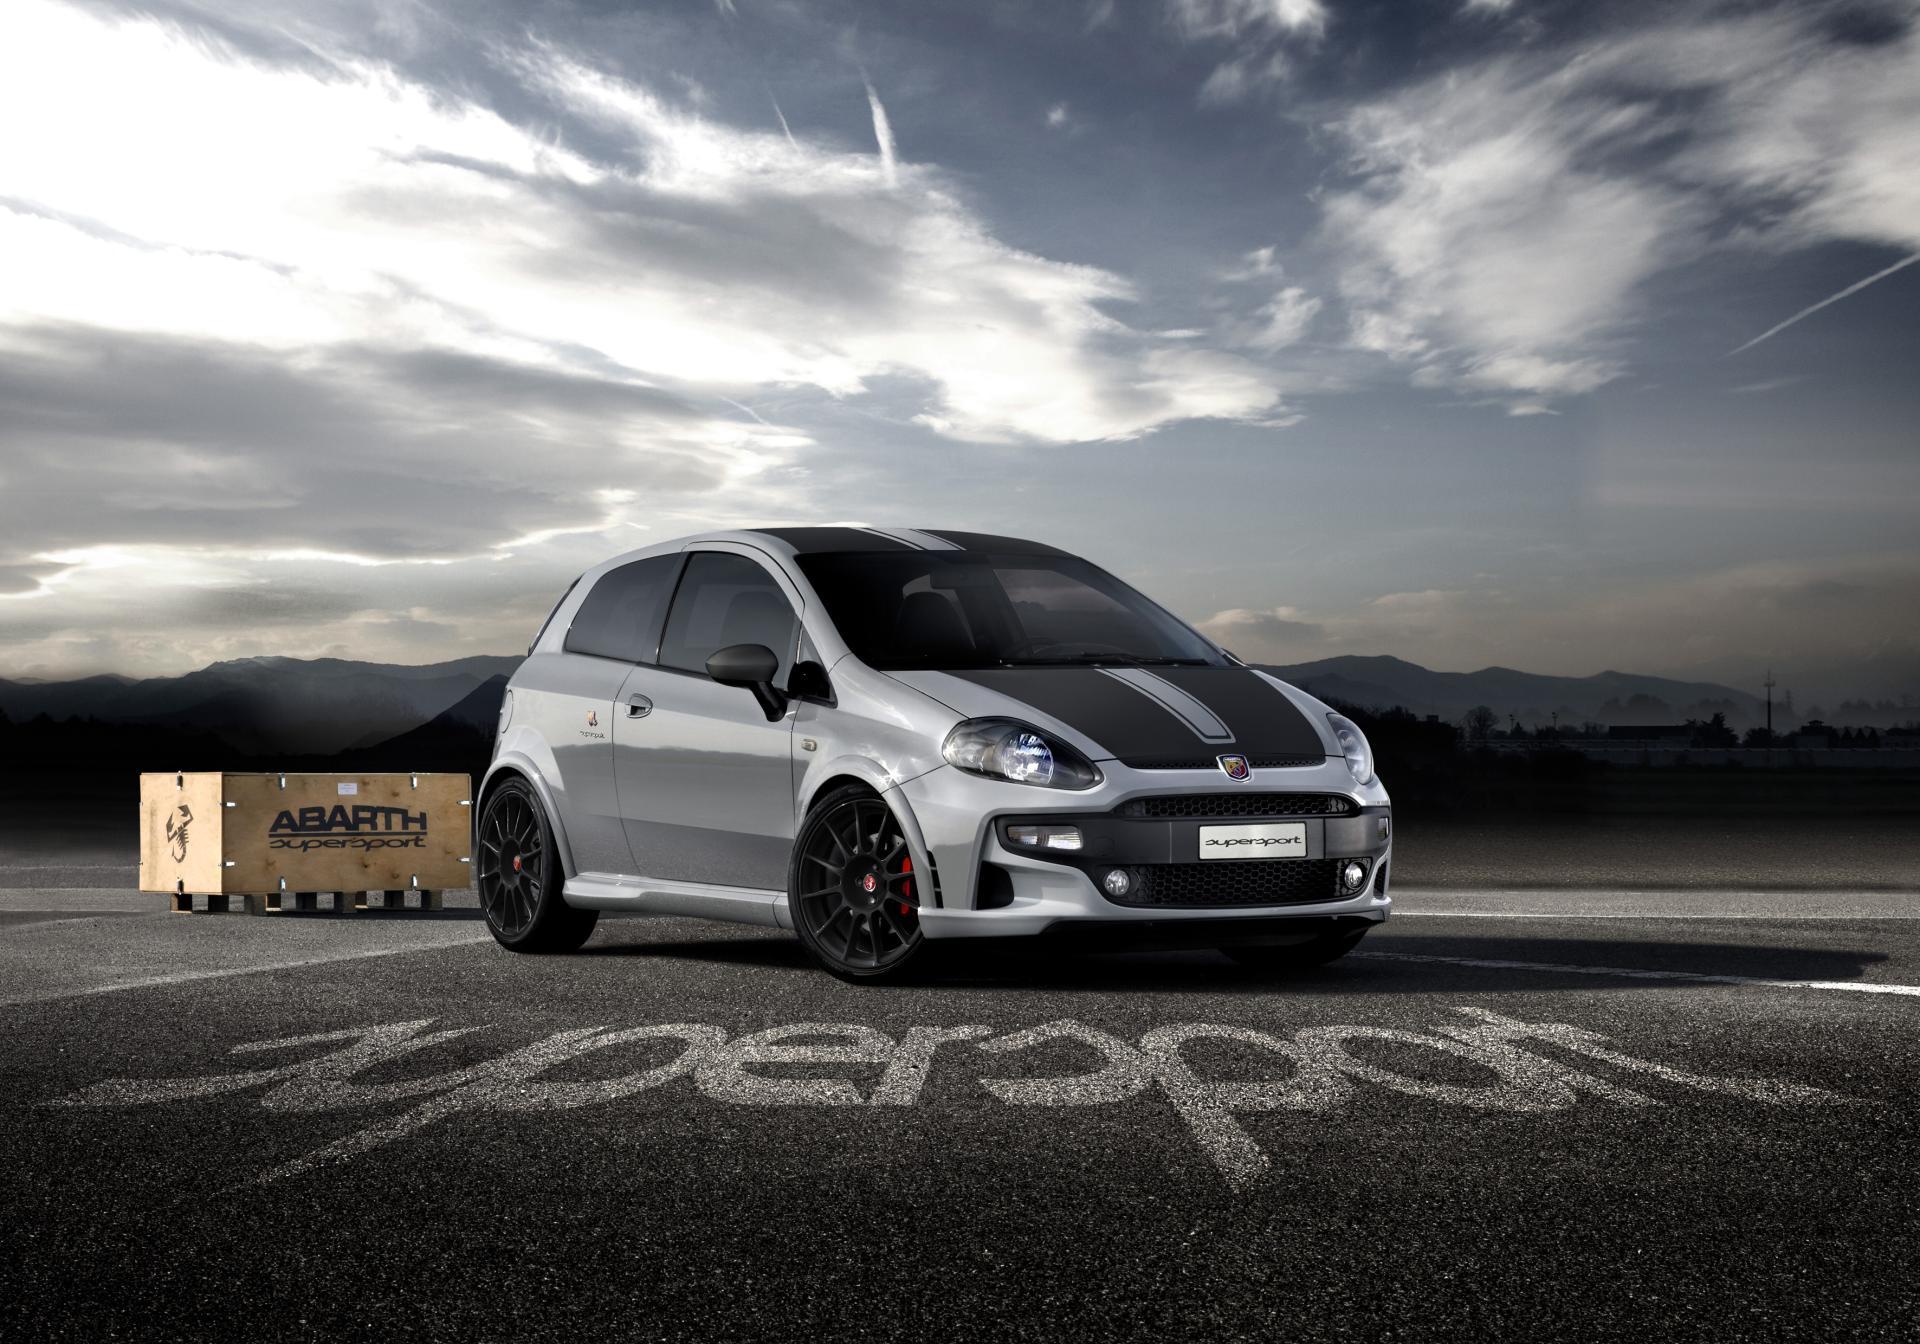 2012 Abarth 500 Punto Supersport Conceptcarz Com